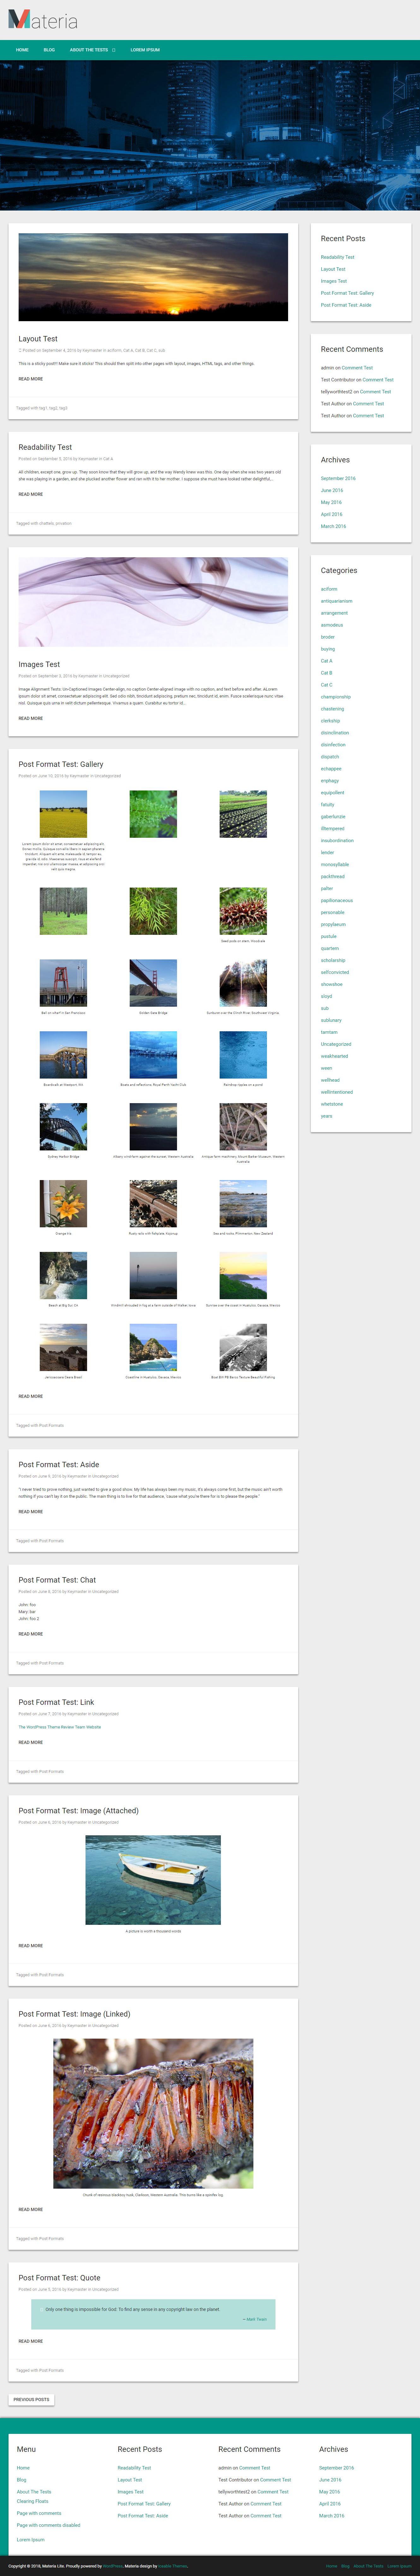 Materia Lite - Best Free Material Design WordPress Theme